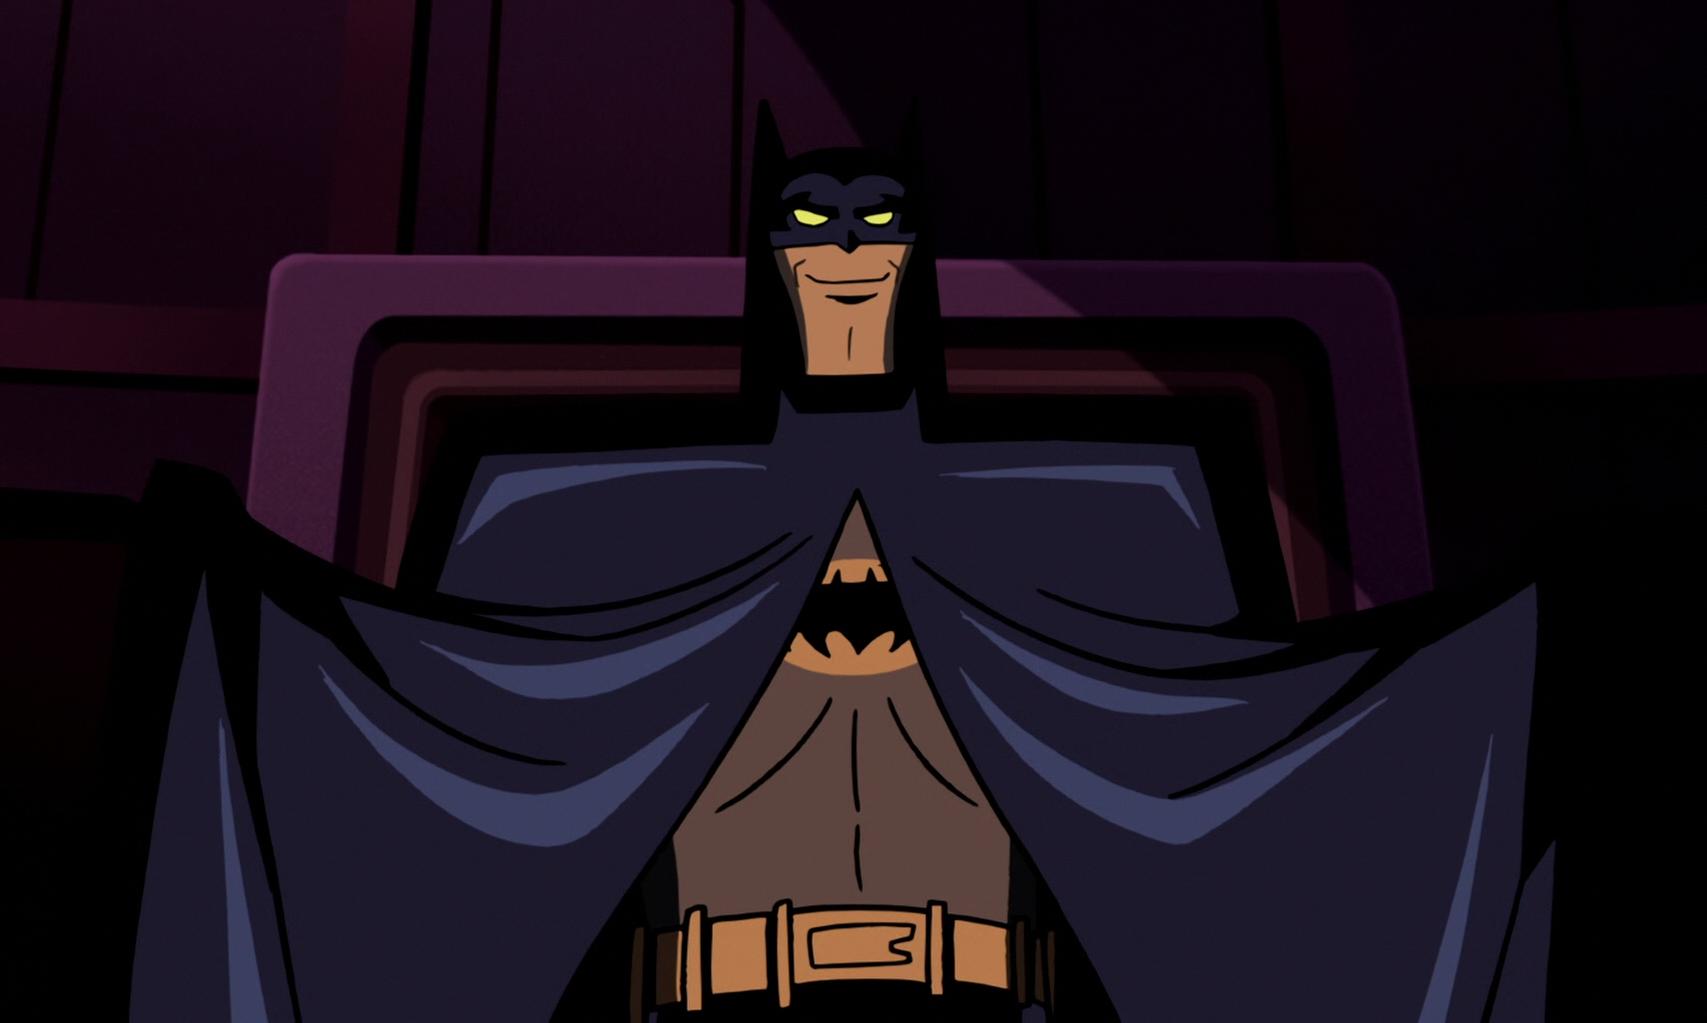 File:Bruce Wayne BTBATB 023.png